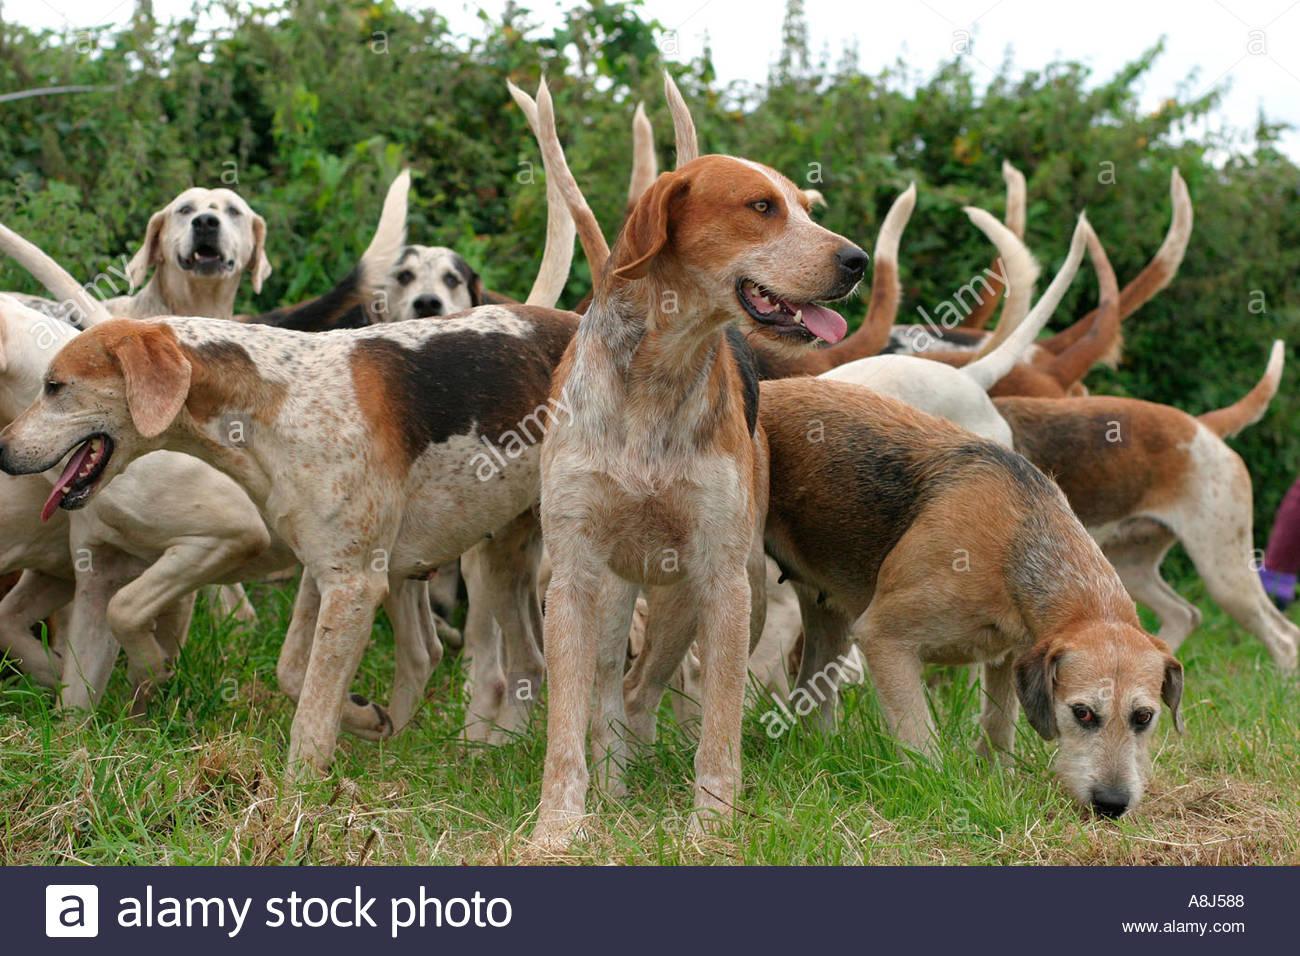 Pack of fox hunting hounds Dorset UK - Stock Image